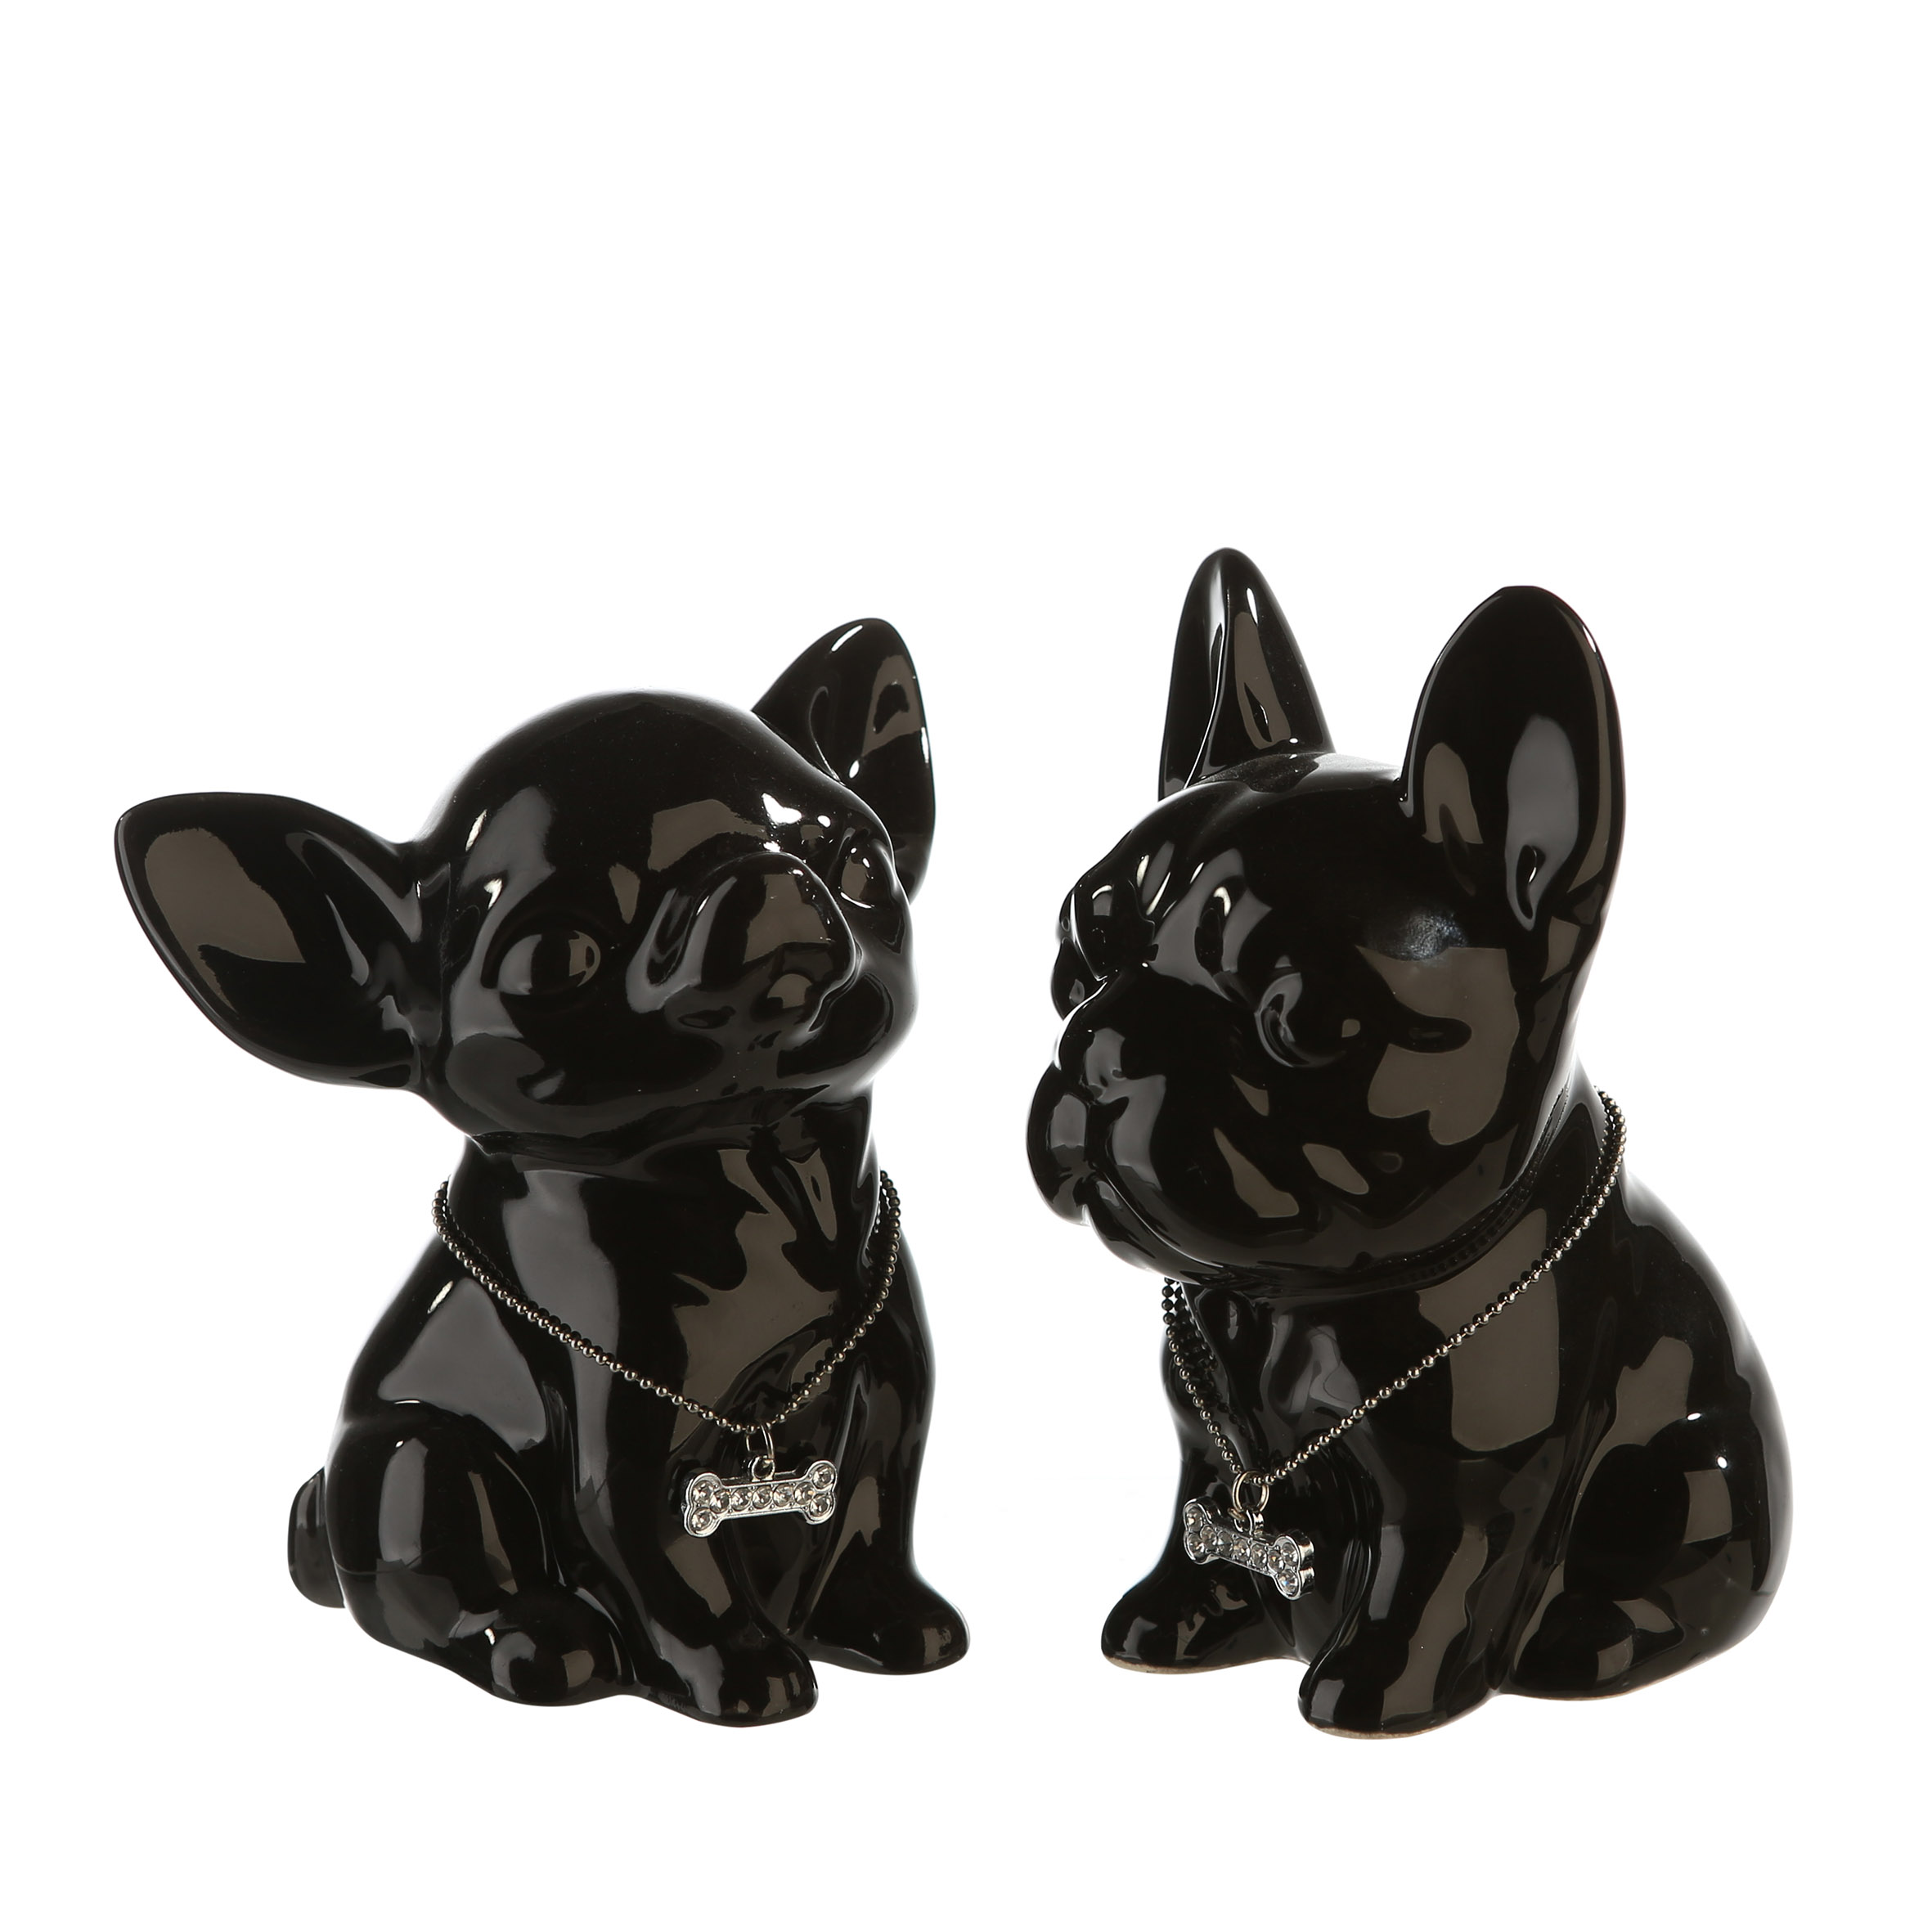 Casablanca-Spardosen-Spardose-Mini-Dog-Keramik-schwarz